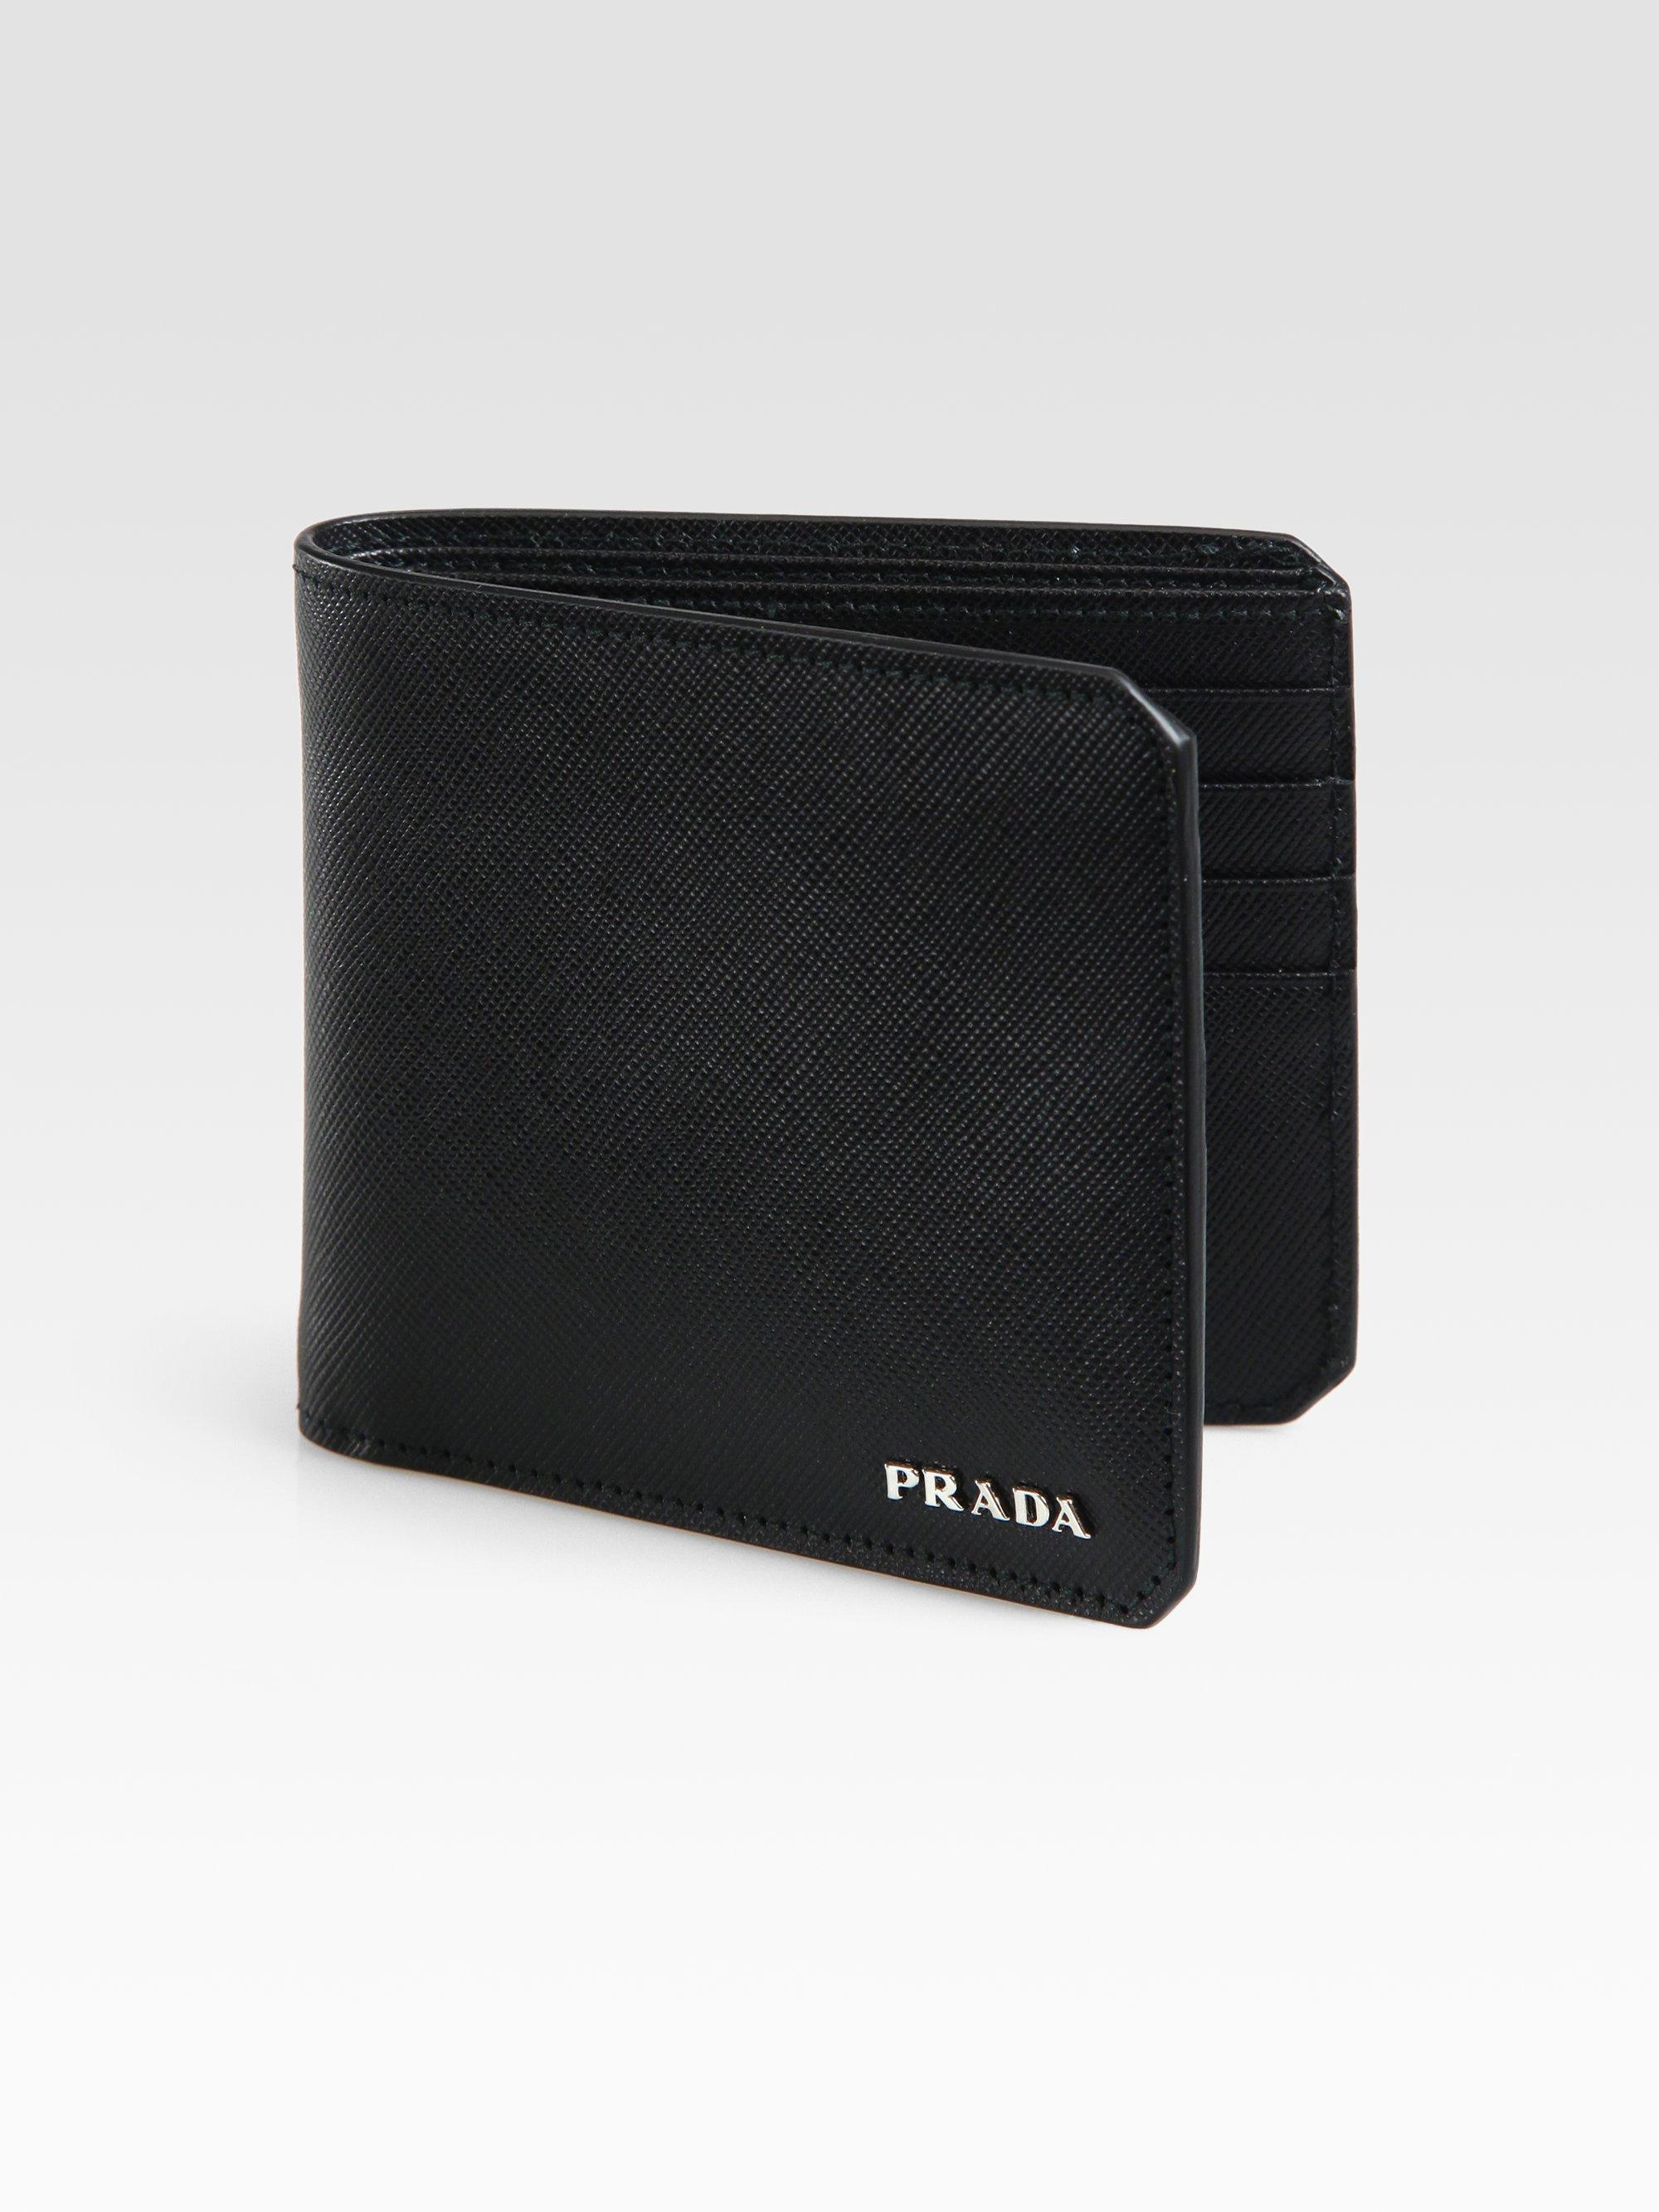 Prada Saffiano Leather Wallet in Black for Men | Lyst